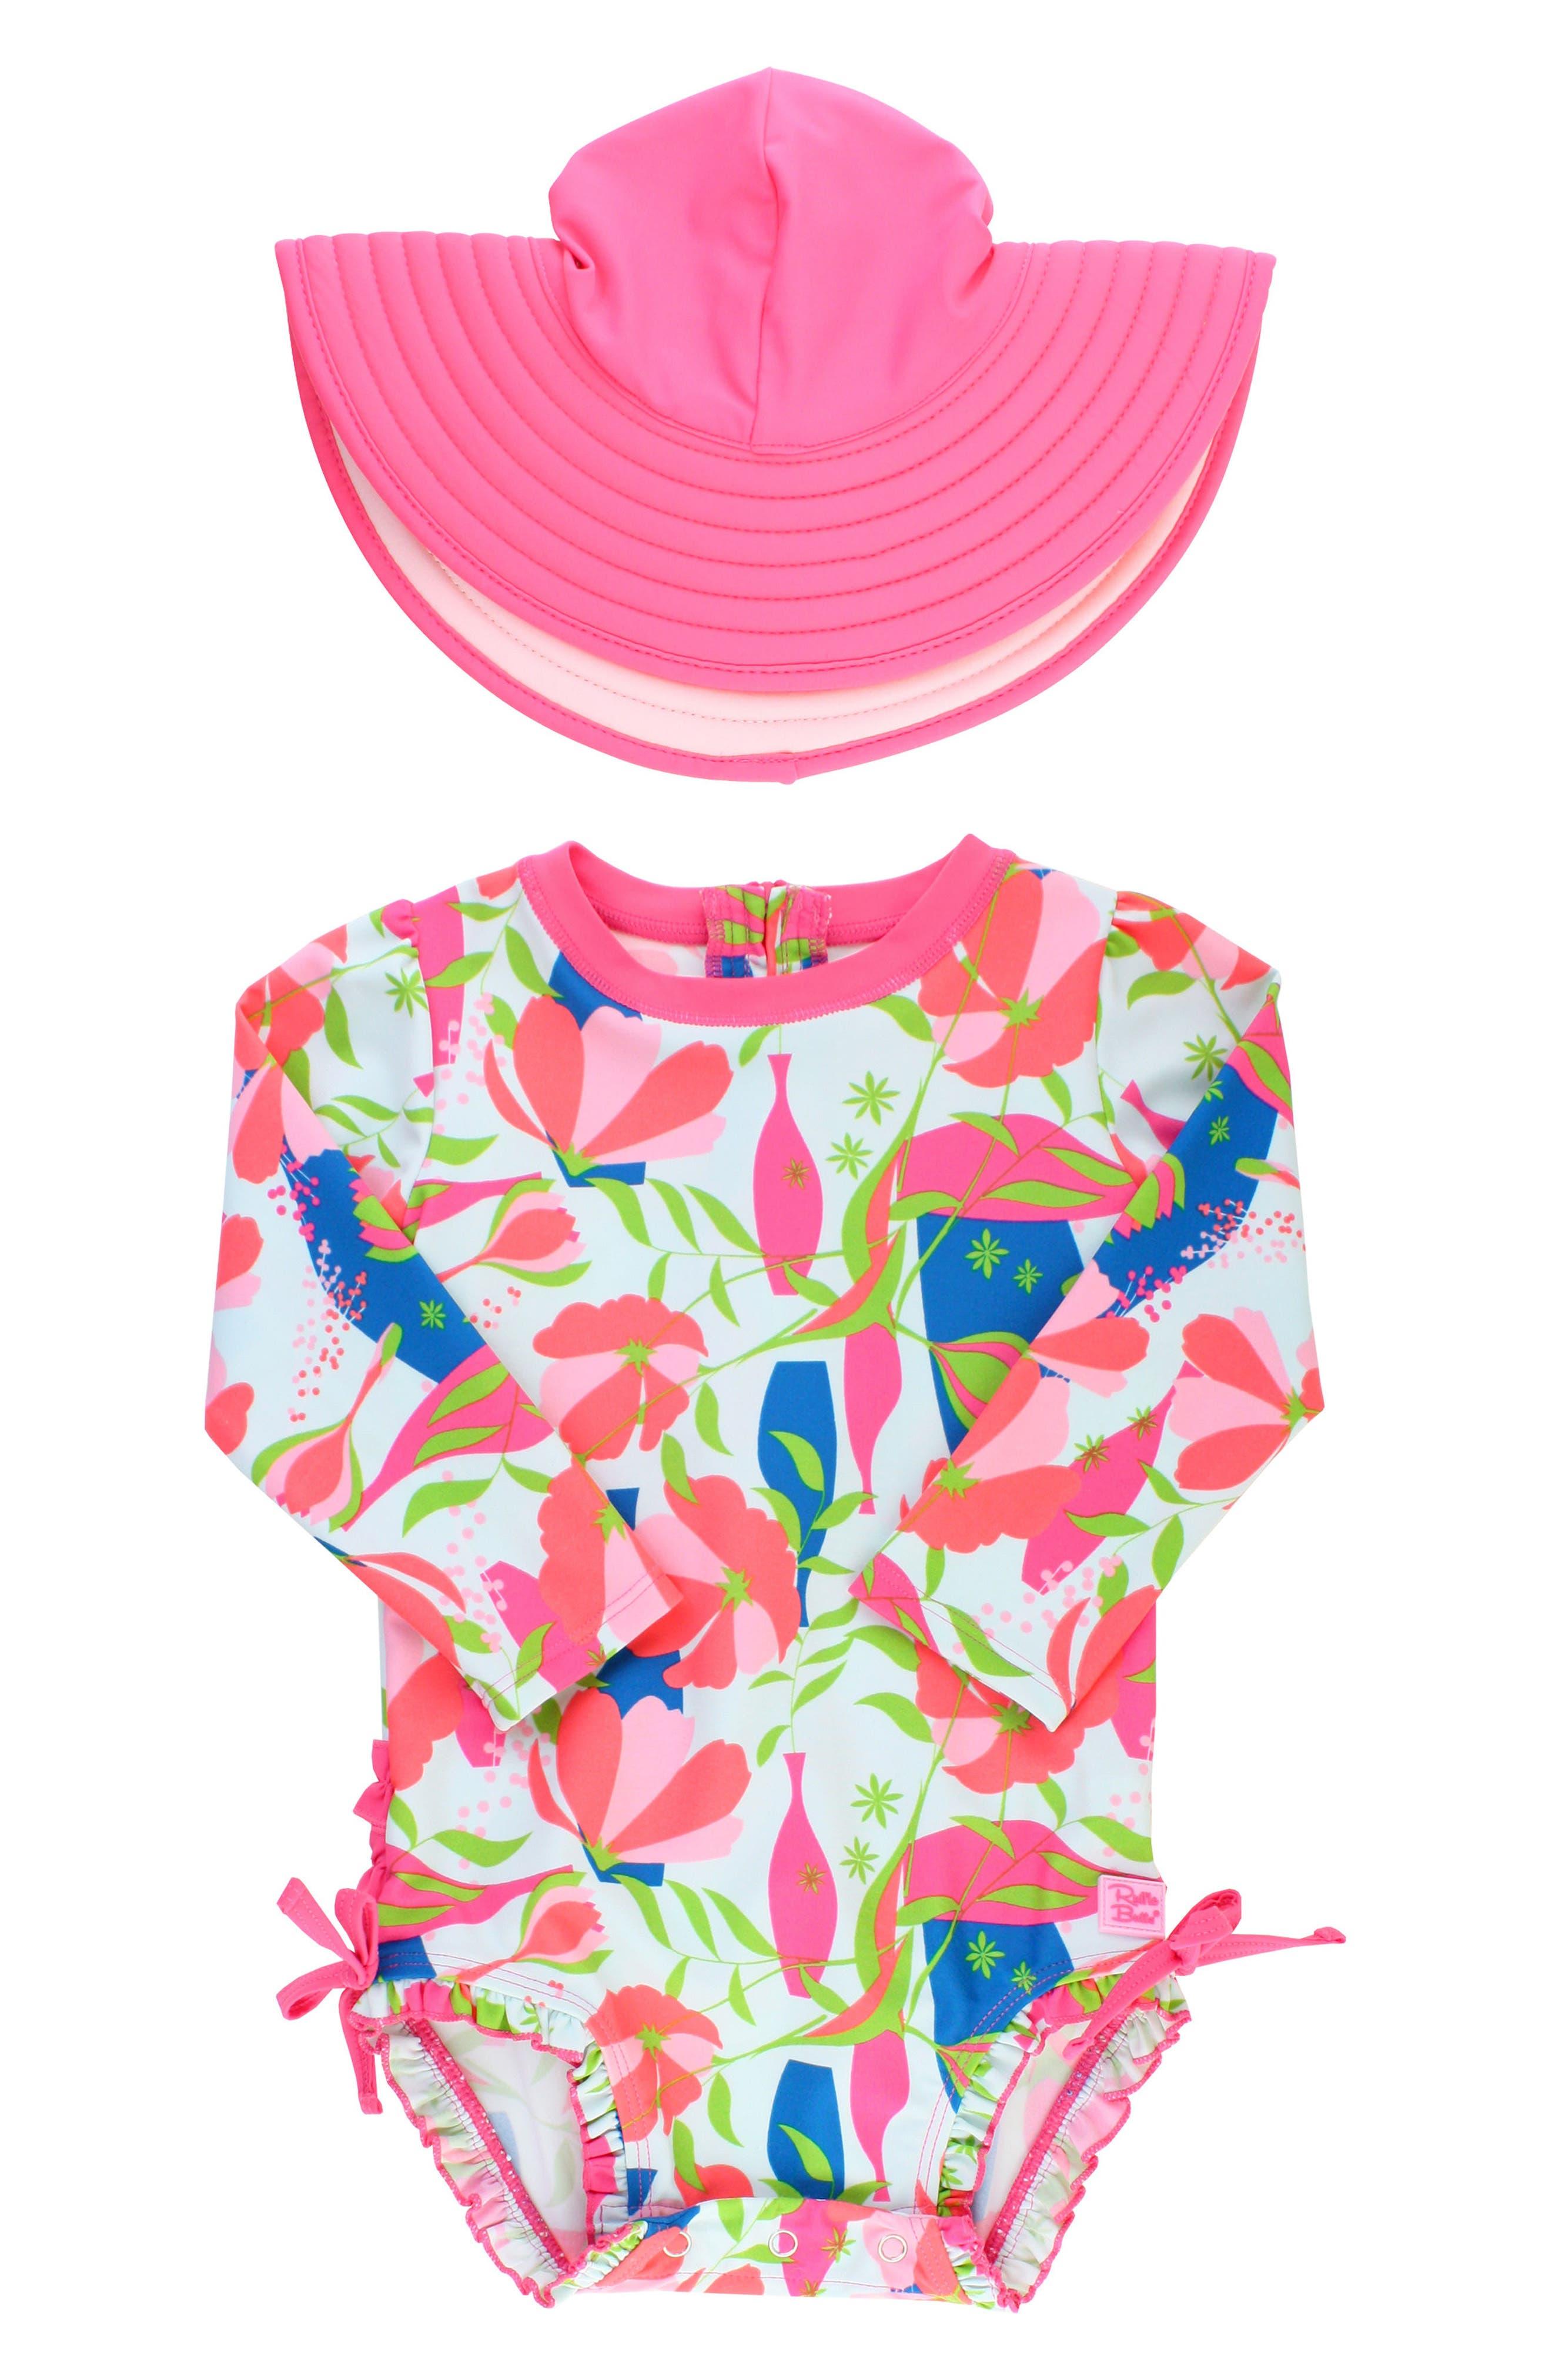 Ruffle Butts Jeweled Stems One-Piece Rashguard Swimsuit & Sun Hat Set,                             Main thumbnail 1, color,                             670